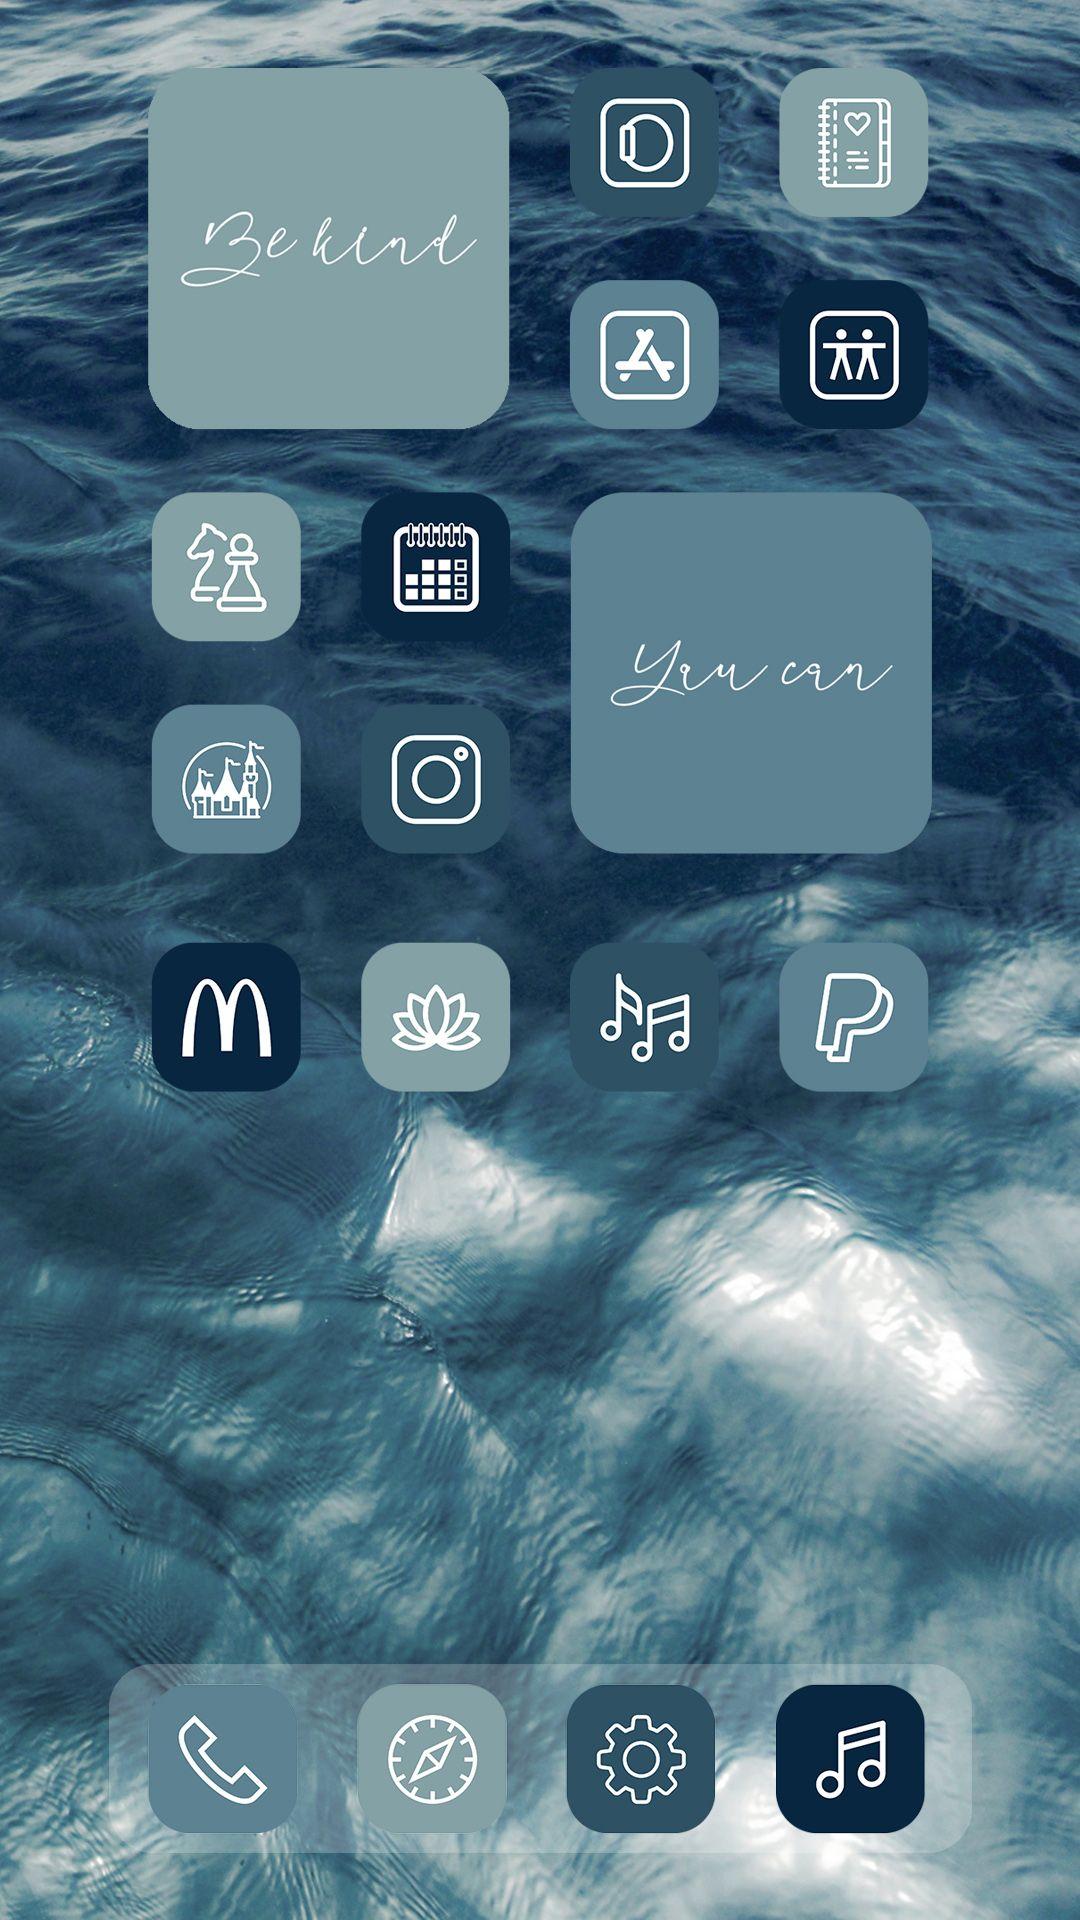 Ios 14 icons nautical Aesthetic ios 14 - etsy